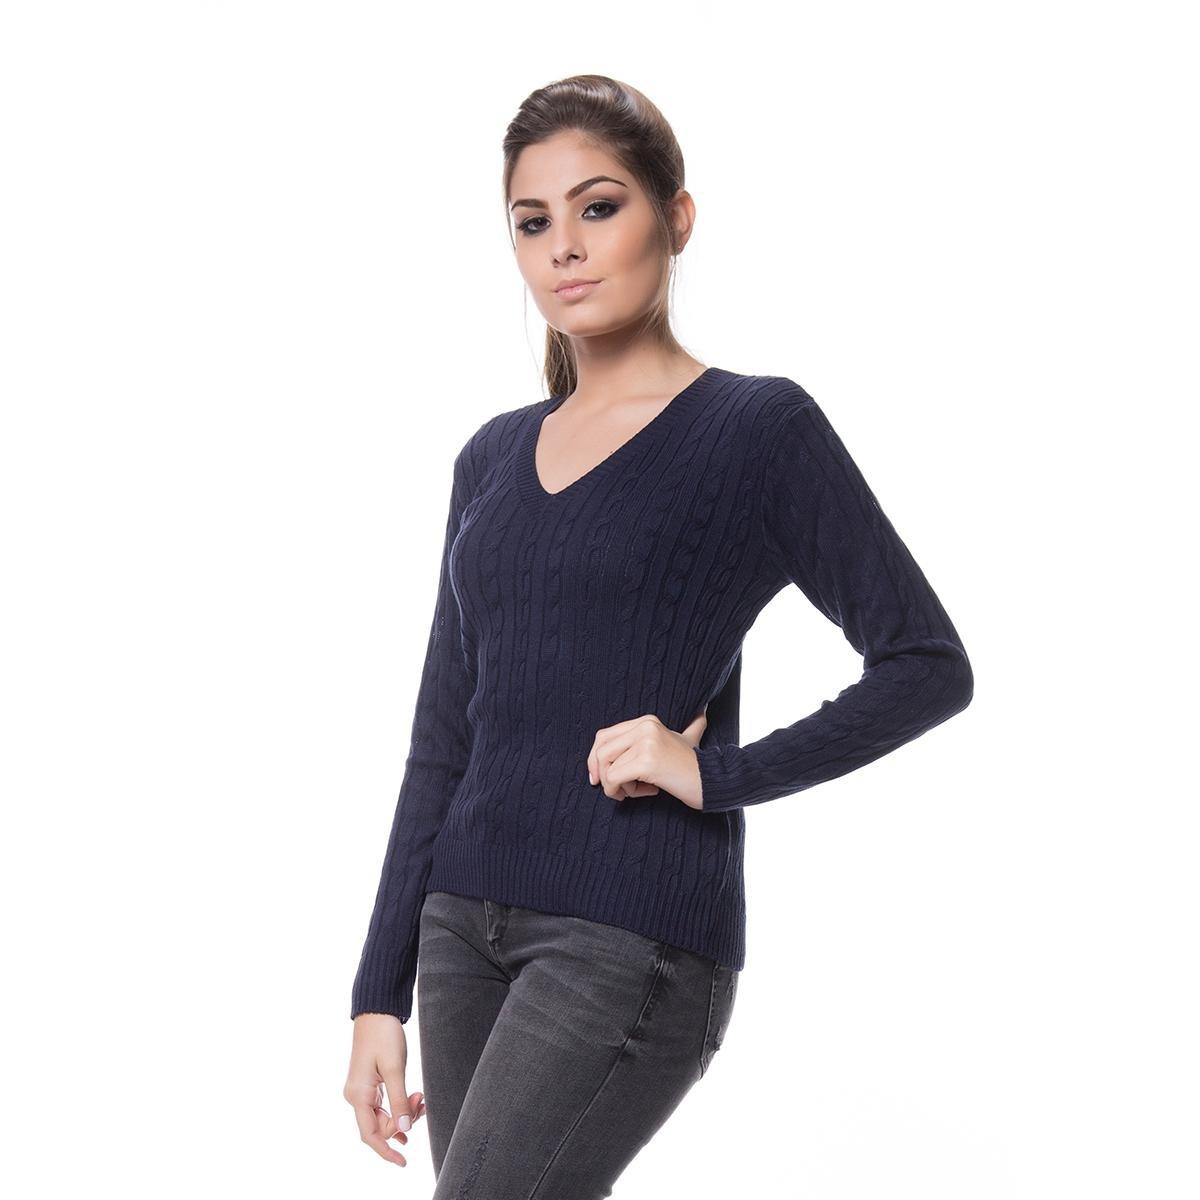 Blusa Logan Tricot Basica de Trança - Azul Escuro - Compre Agora ... 11789c84a9d